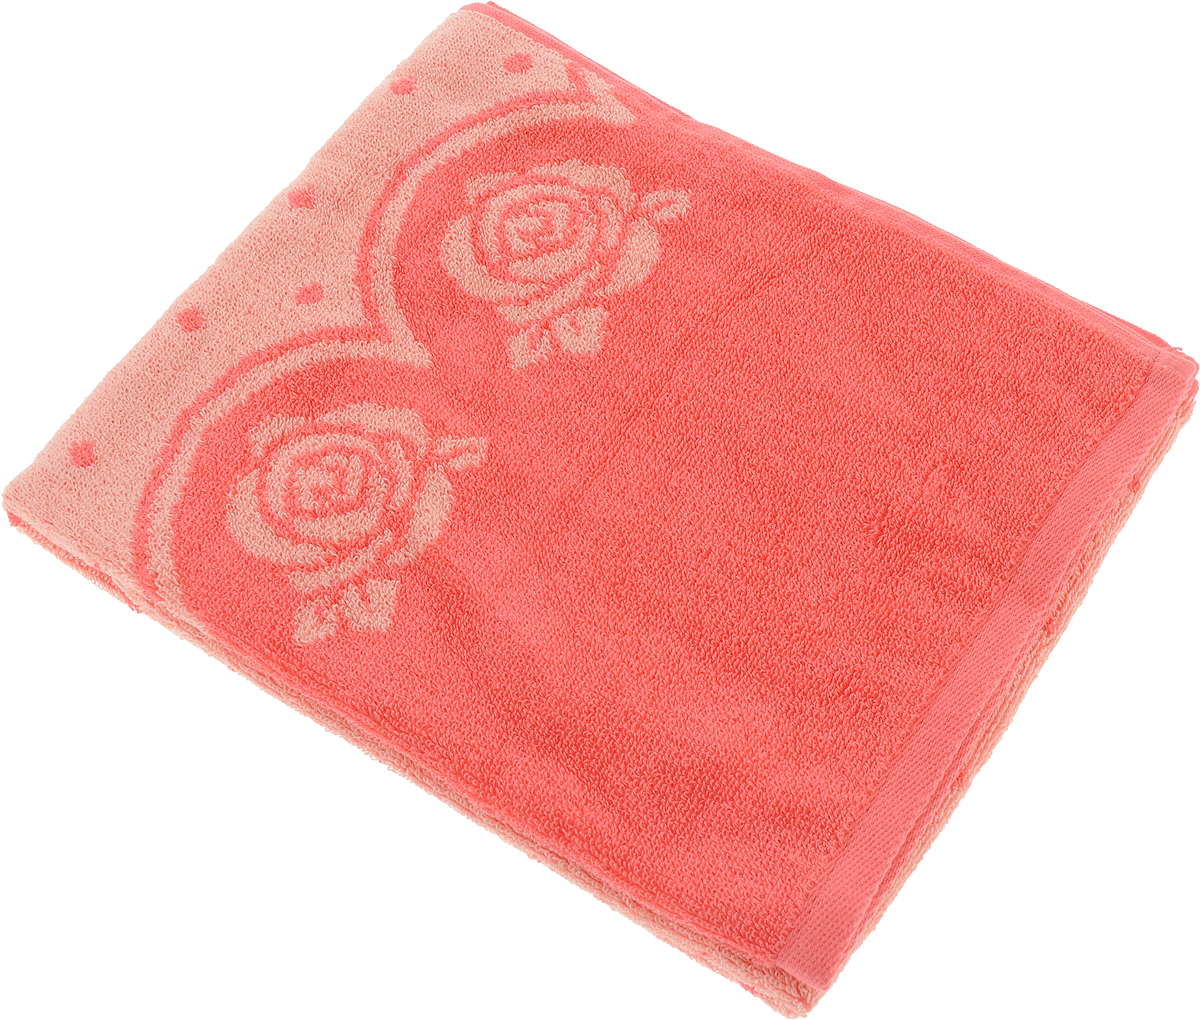 Полотенце Aquarelle Розы 3, цвет: розово-персиковый, коралловый, 50 х 90 см полотенце aquarelle стамбул 70x140cm white blue 710397